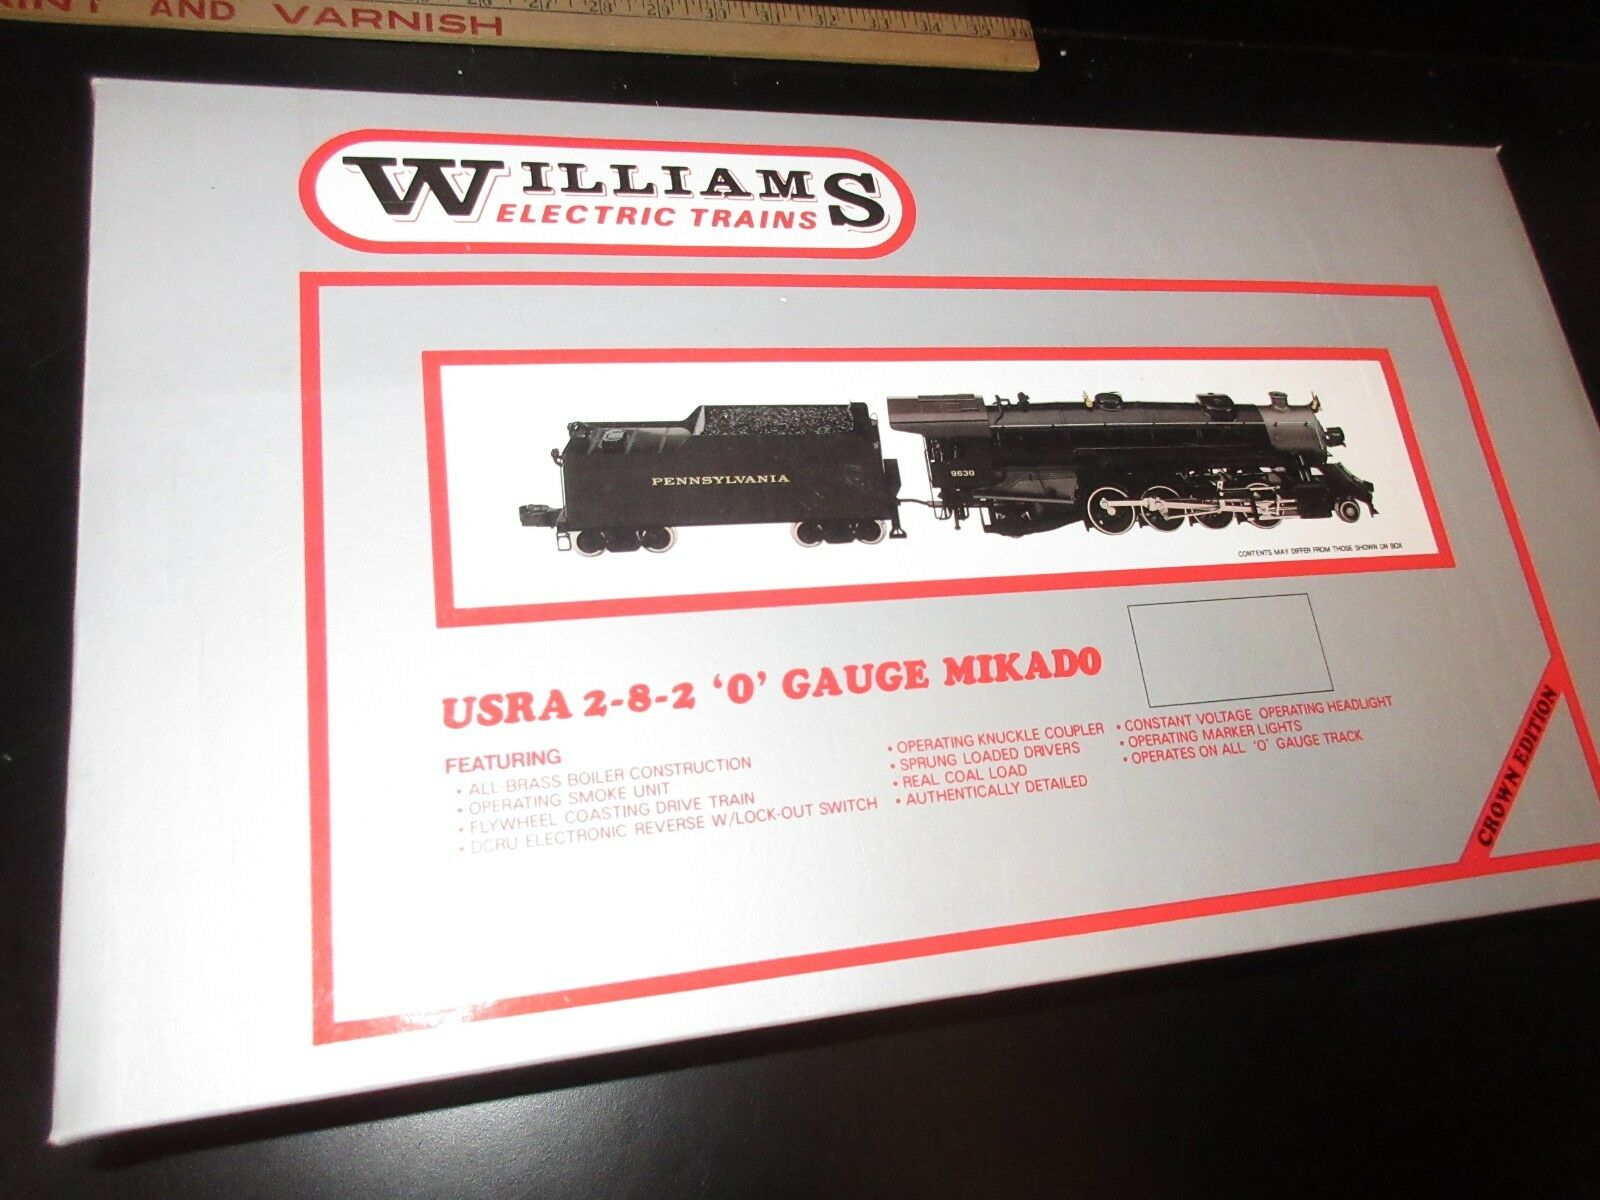 Williams Brass Pennsylvania O Gauge Mikado Steam Engine and Tender